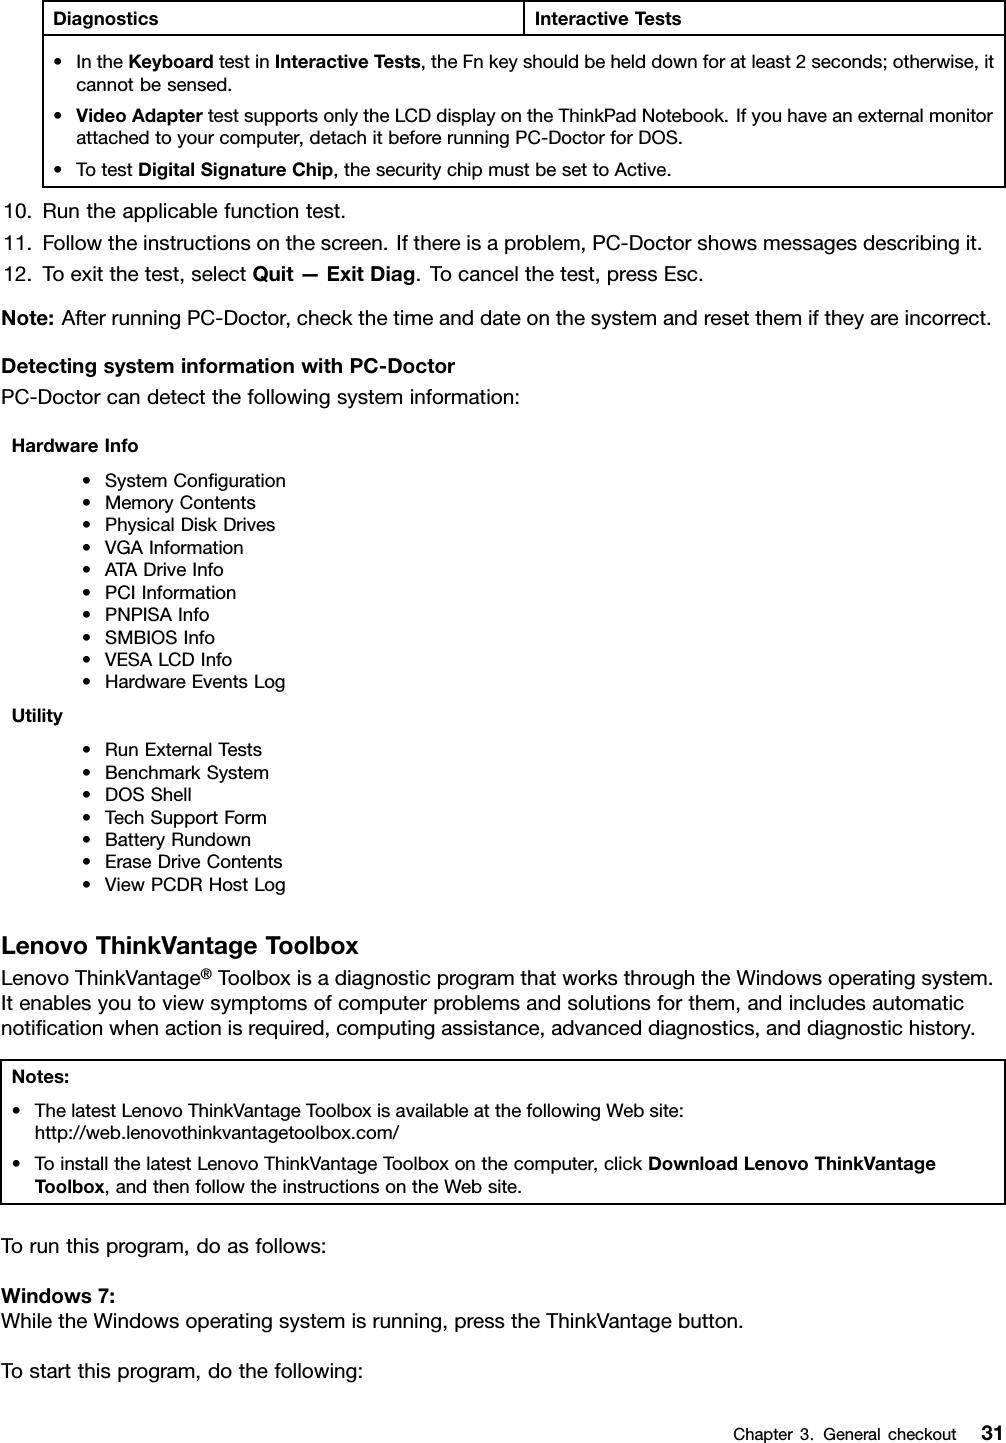 Lenovo T420 T420I Hmm User Manual Hardware Maintenance Think